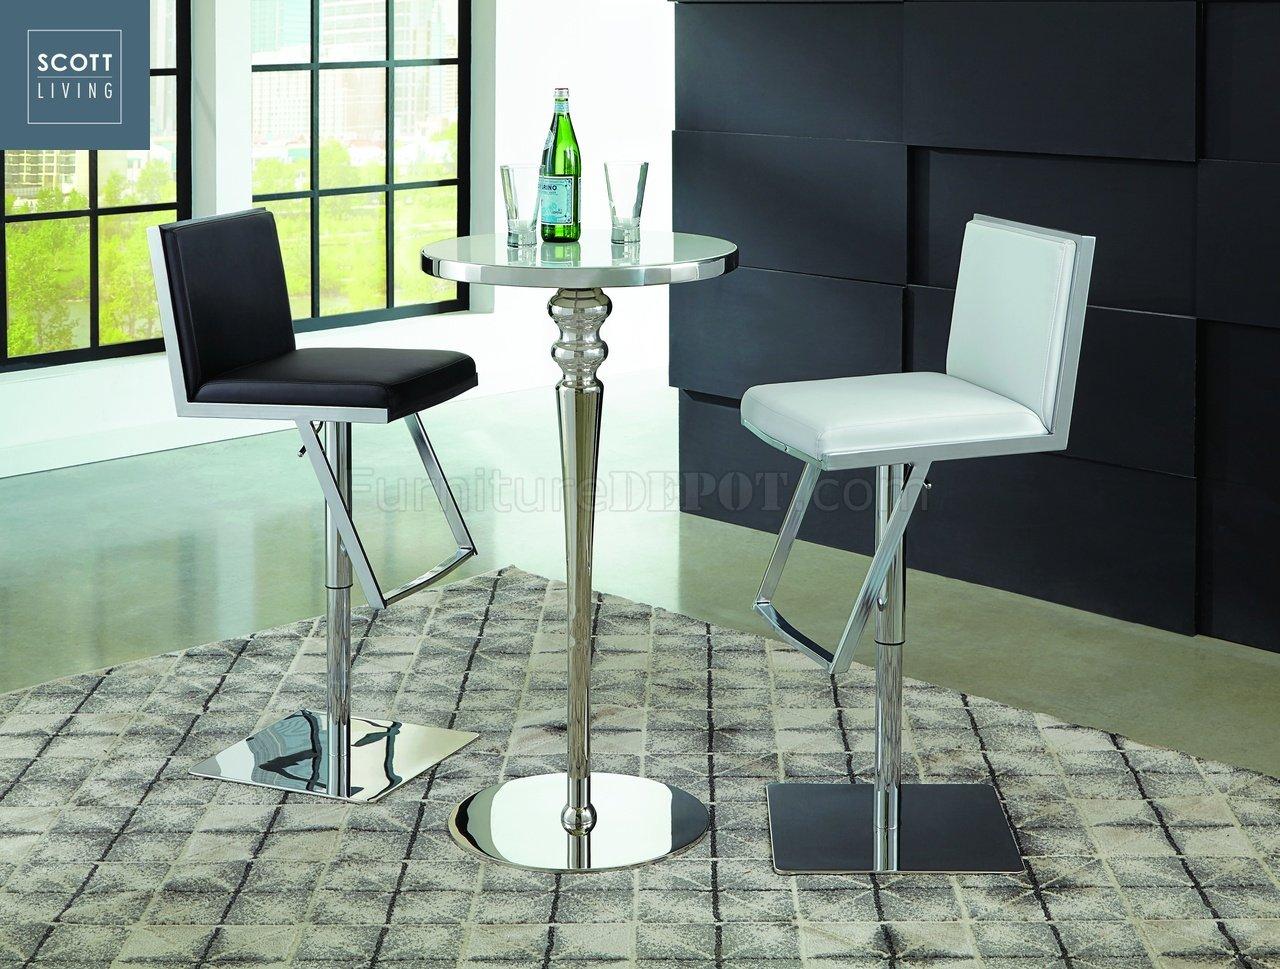 Dixon Bar Table 3Pc Set 182031   Scott Living   Coaster